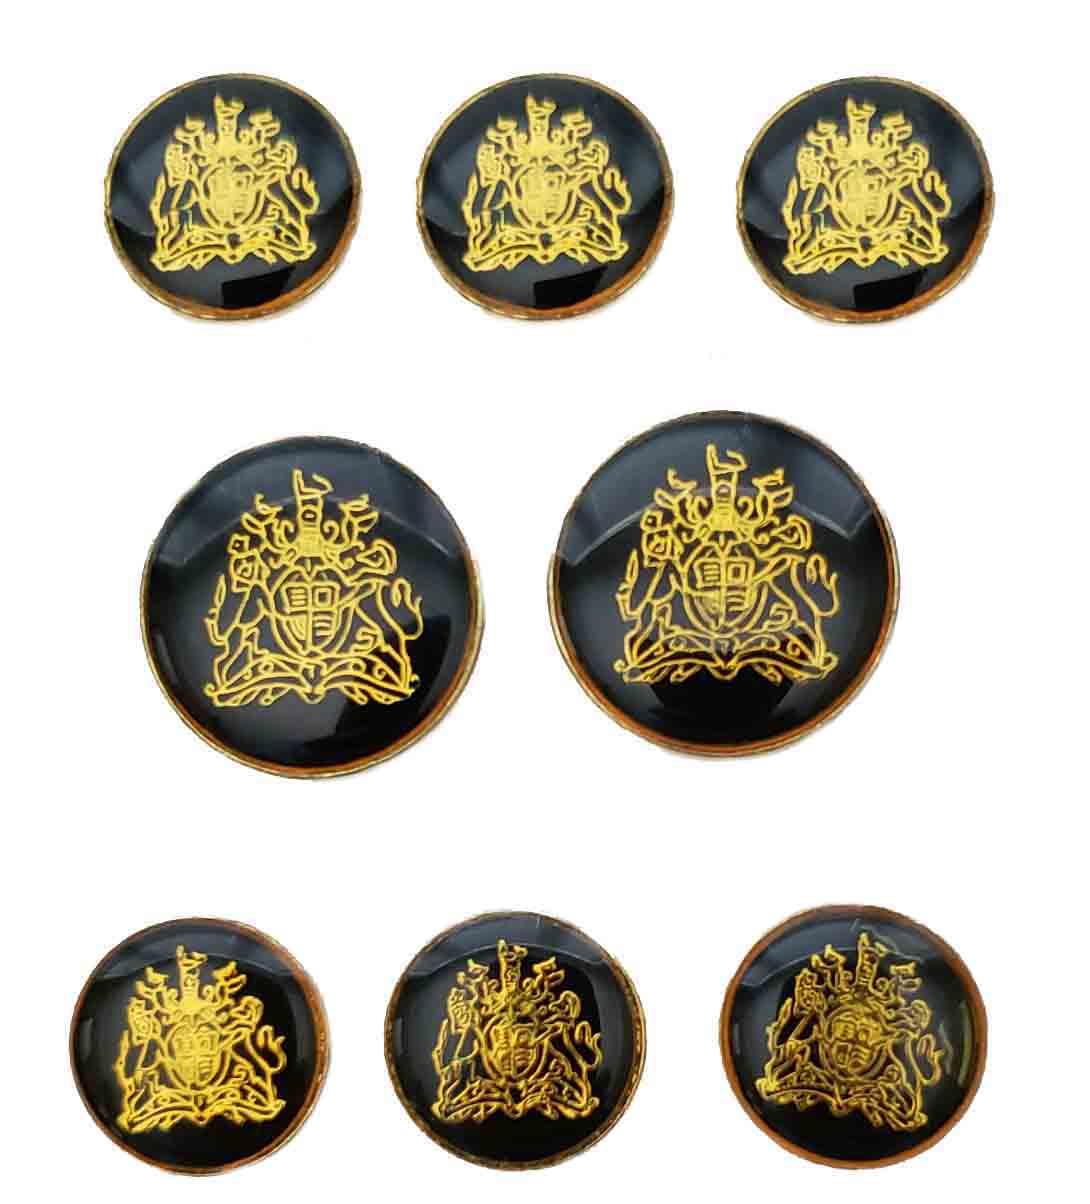 Vintage Oleg Cassini Blazer Buttons Set Gold Black Enamel and Brass Lions Shield Men's